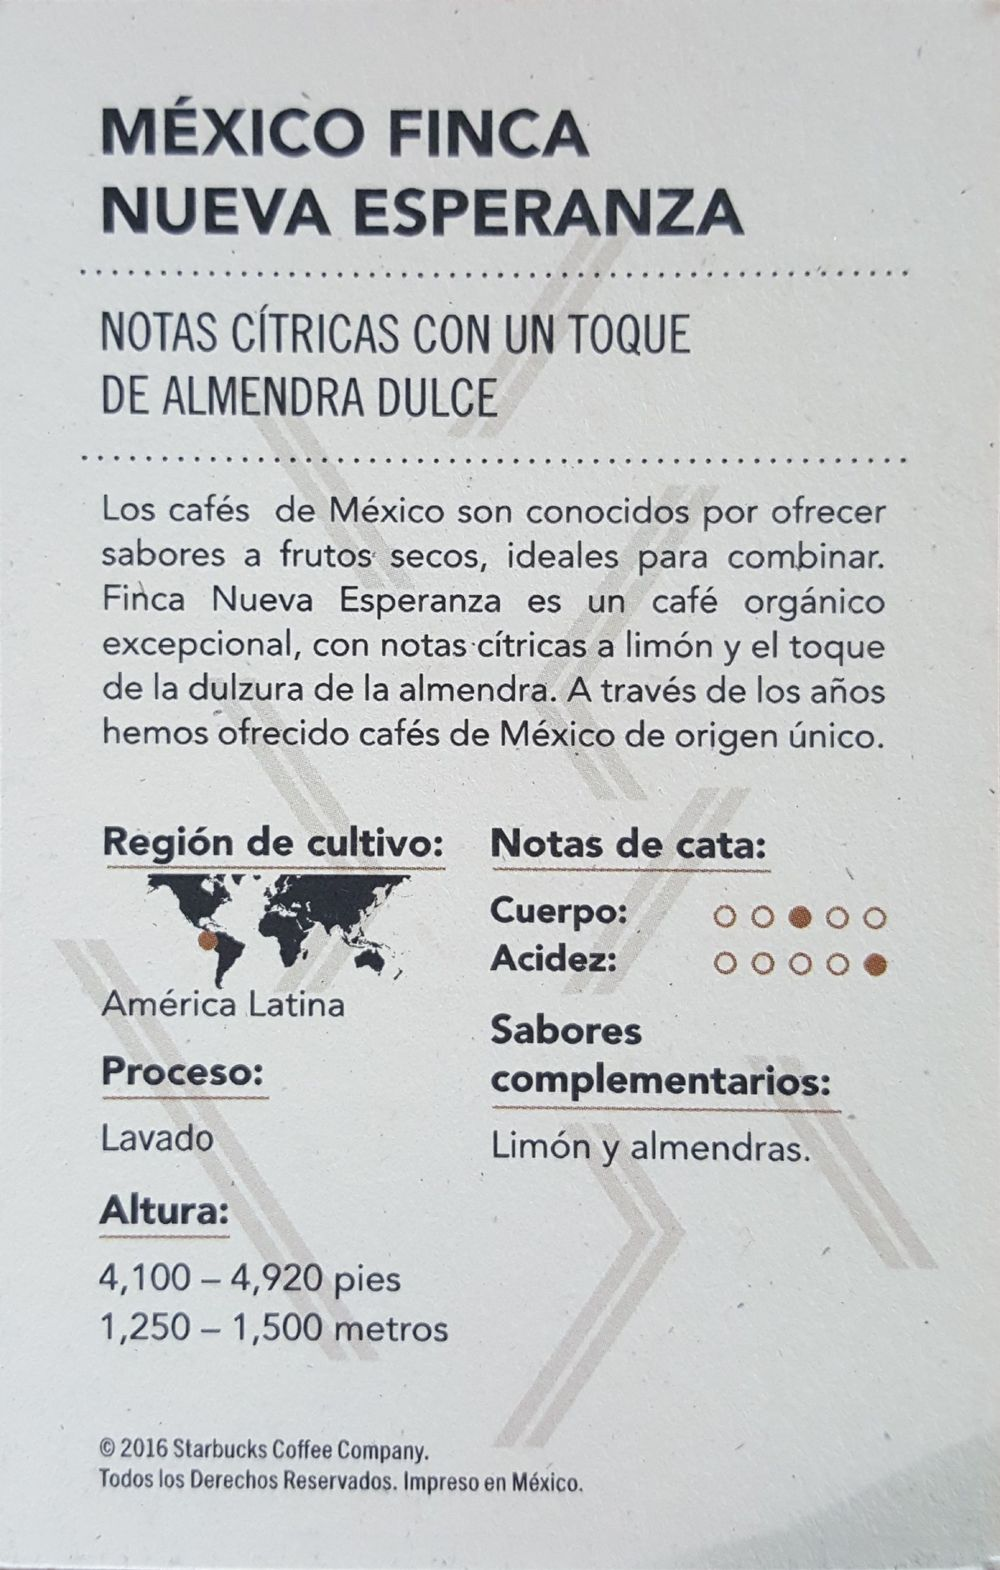 New Doc 127_2 Back side of card for Mexico Finca Nueva Esperanza.jpg